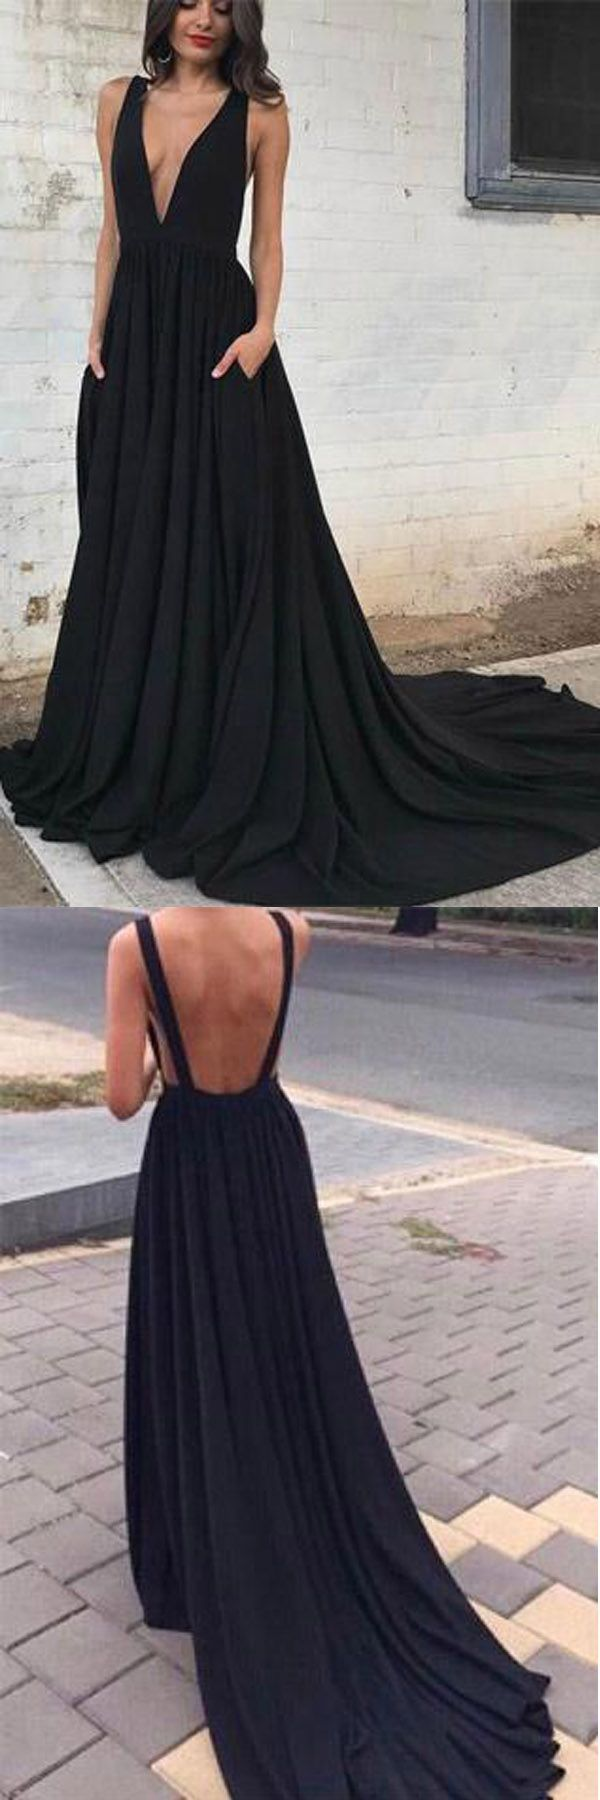 Simple Black Chiffon Backless Deep V Neck A line Long Prom Dress PG559 #promdresses #eveningdresses #pgmdress #blackdress